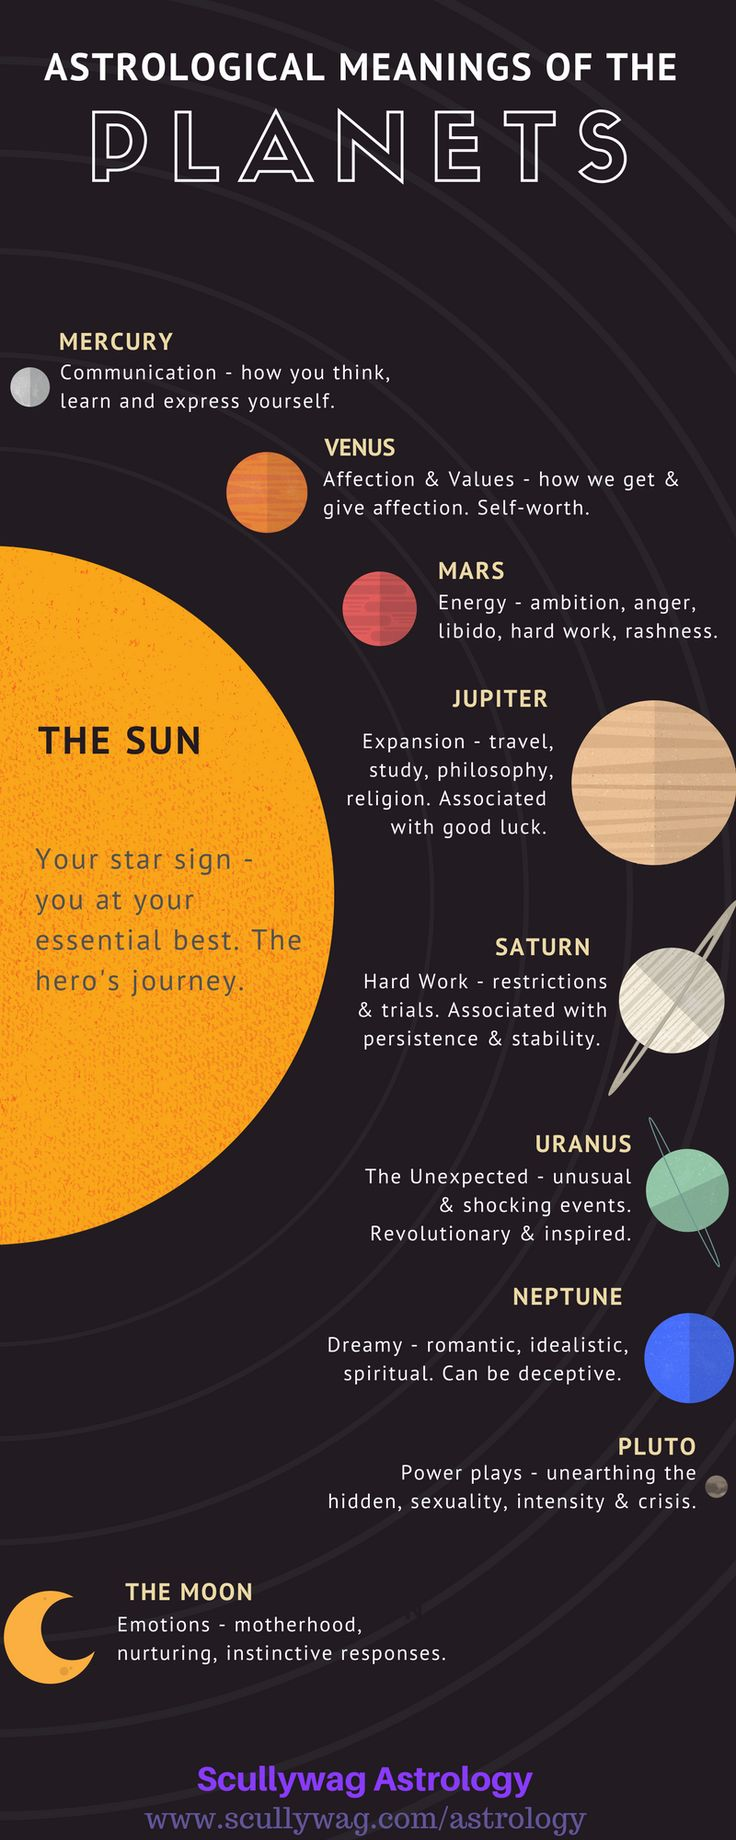 Astrological meanings of the planets and luminaries.   #astrology #planets #luminaries #sun #moon #Mercury #Venus #Mars #Jupiter #Saturn #Uranus #Neptune #Pluto